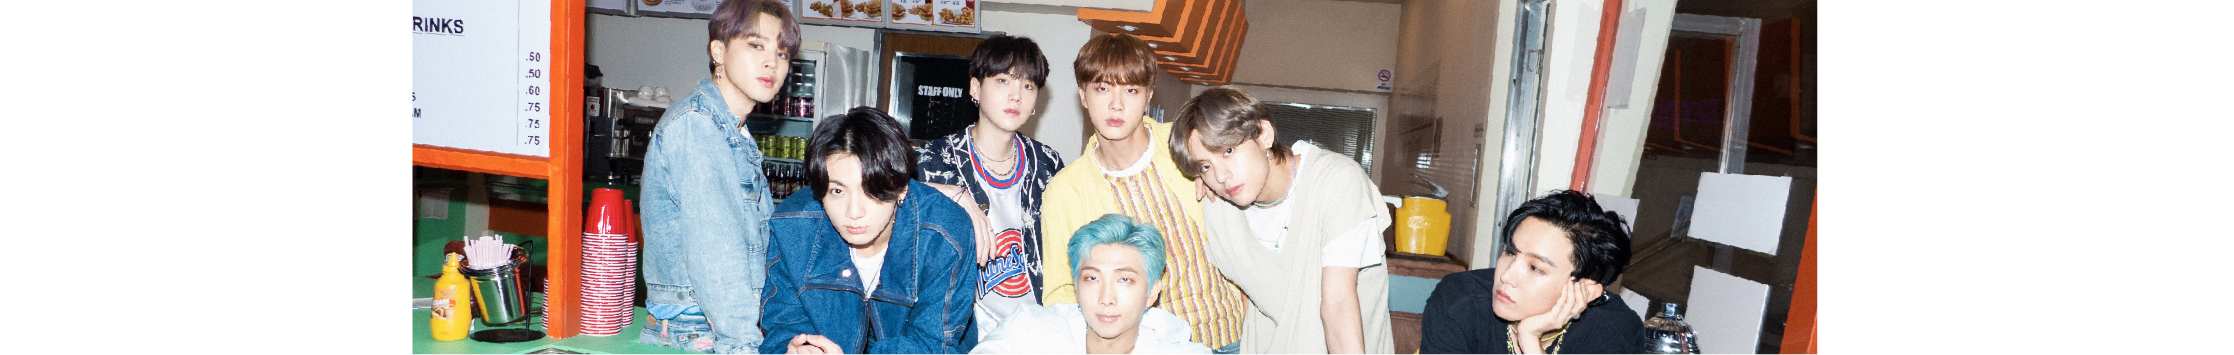 BTS_official banner